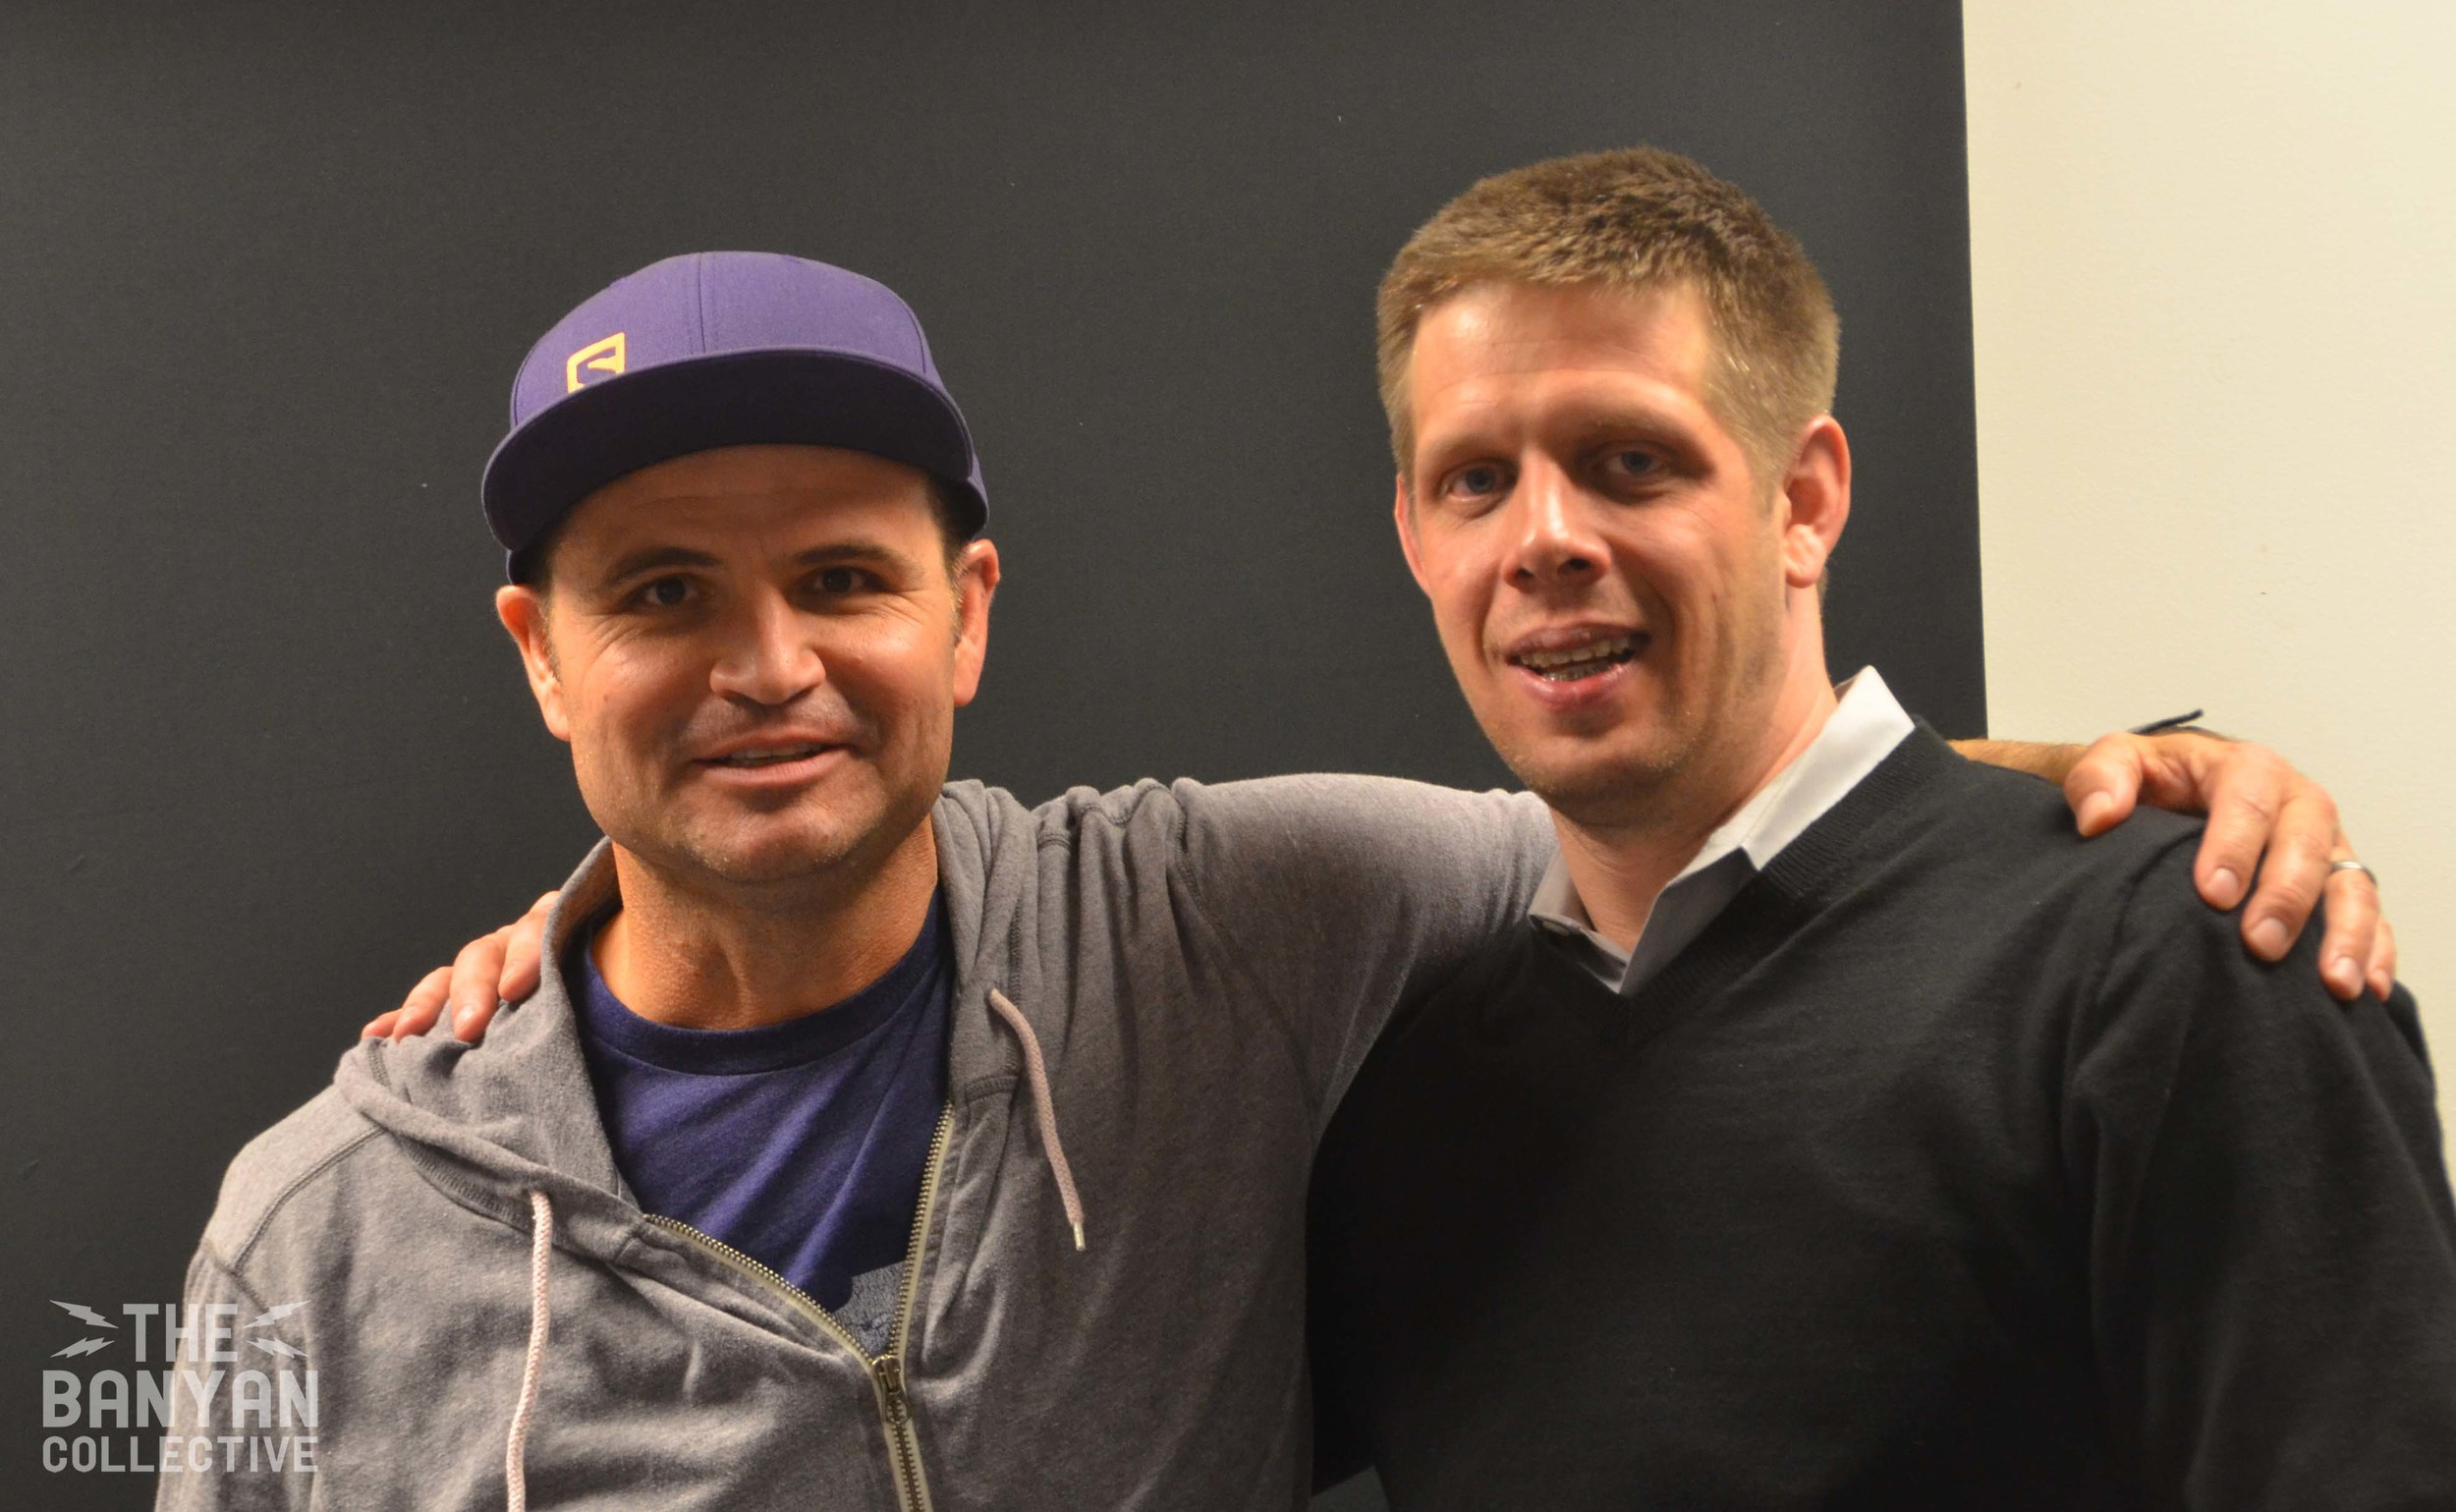 John Wojciechowski withStandard Examiner Publisher, Charles Horton